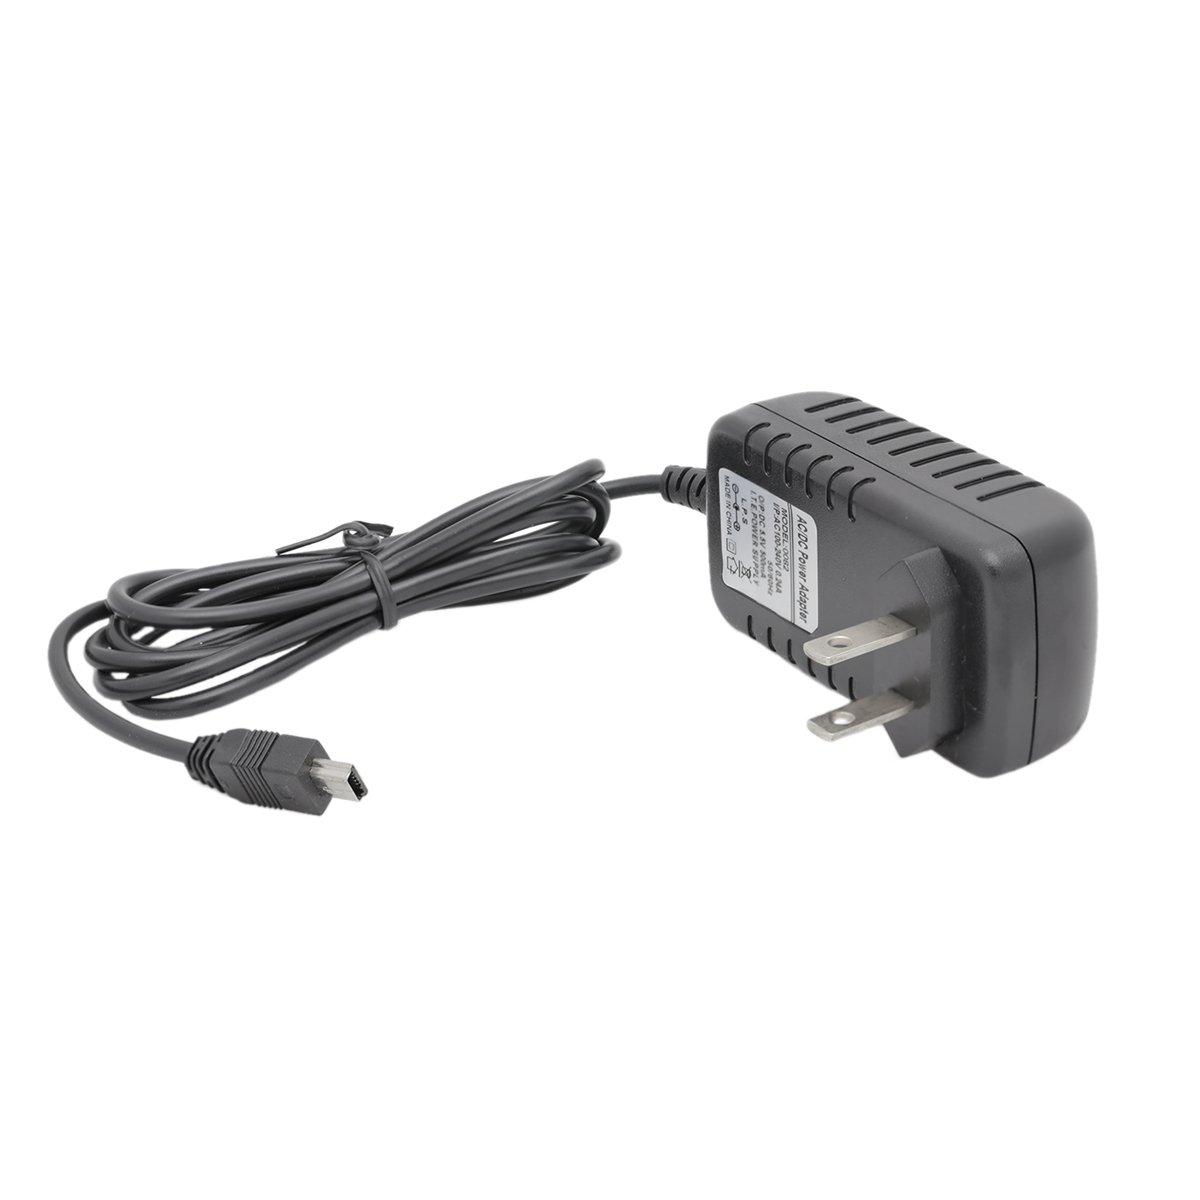 Power Supply PSU POWER1_US 5.5 Volts DC Mini USB , DVC4 , LD , SLESA , SUITE2 , Sunlite , LumiDesk , Daslight and Nicolaudie POWER1